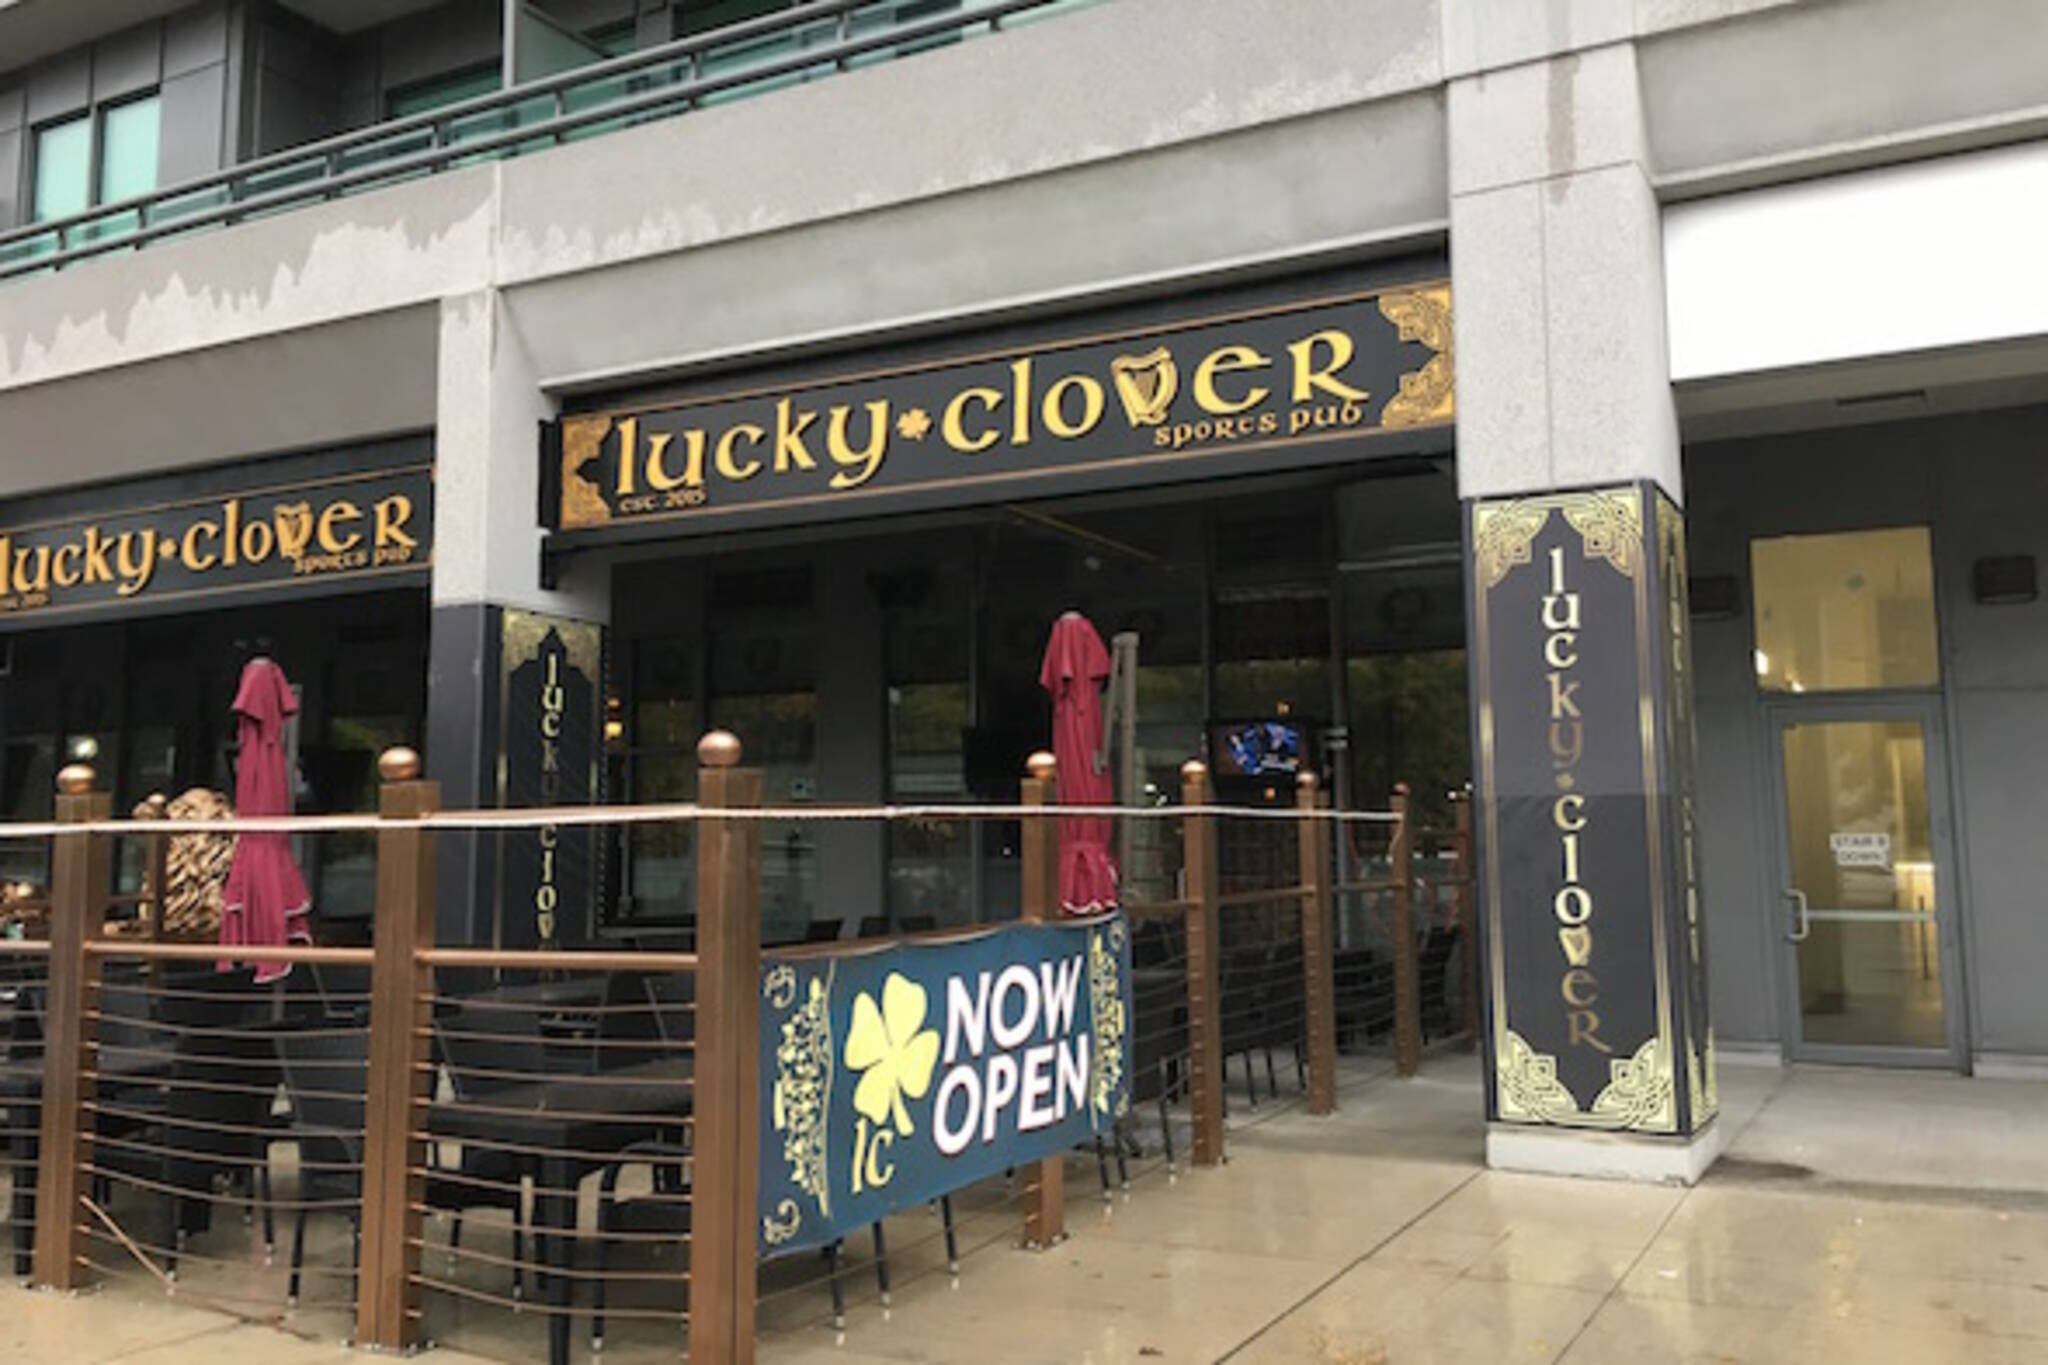 Lucky clover pub Toronto